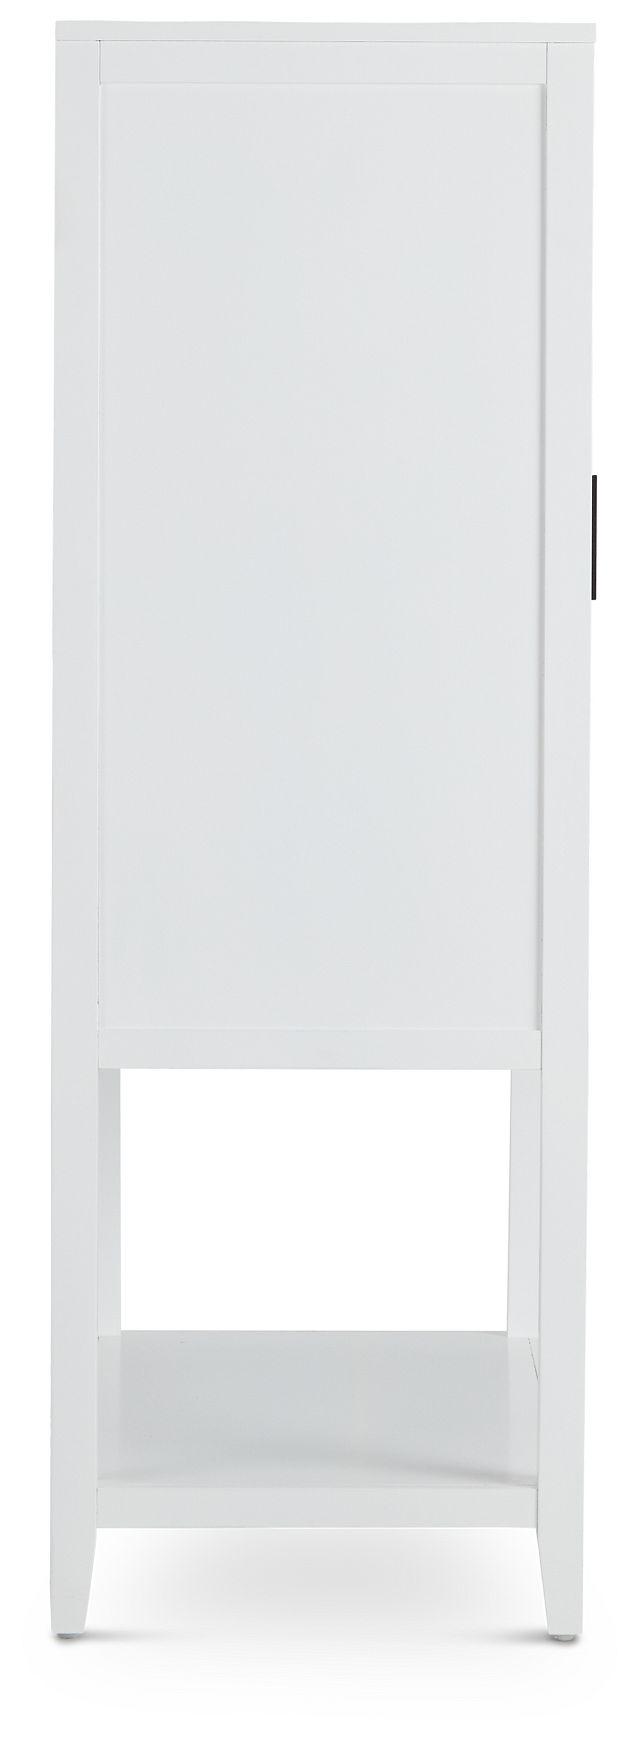 Nantucket Two-tone Woven Bar Cabinet (3)